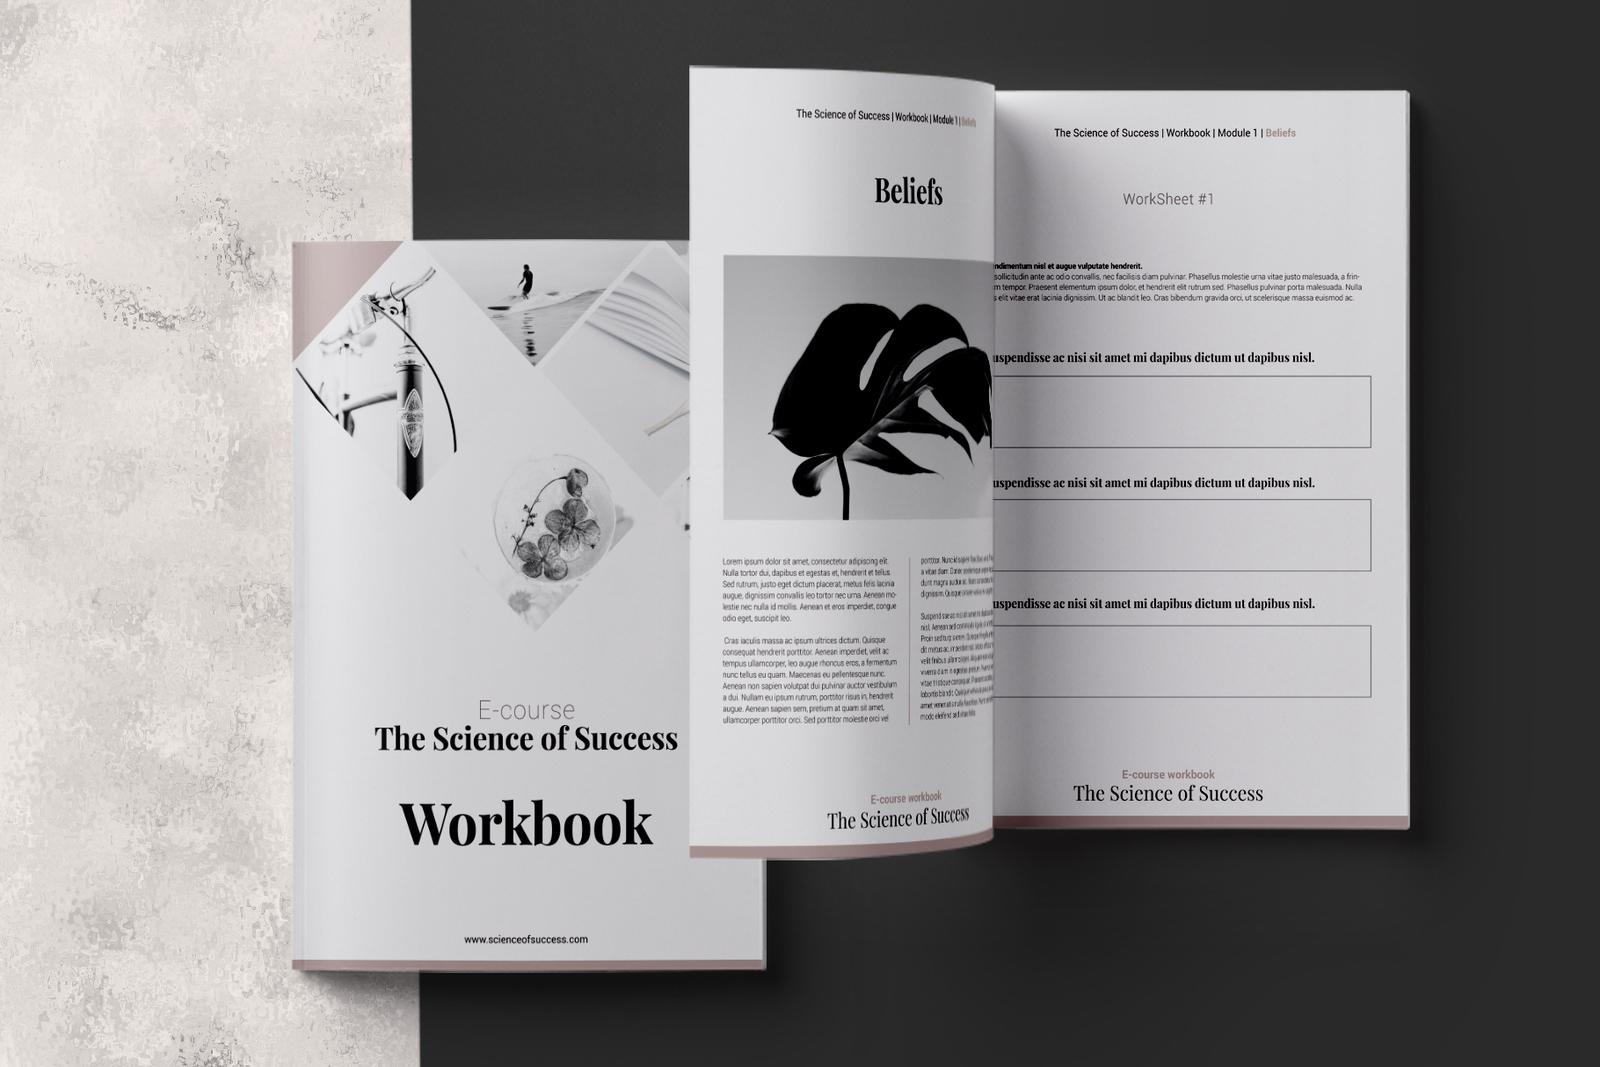 E-course Workbook InDesign Template in Brochure